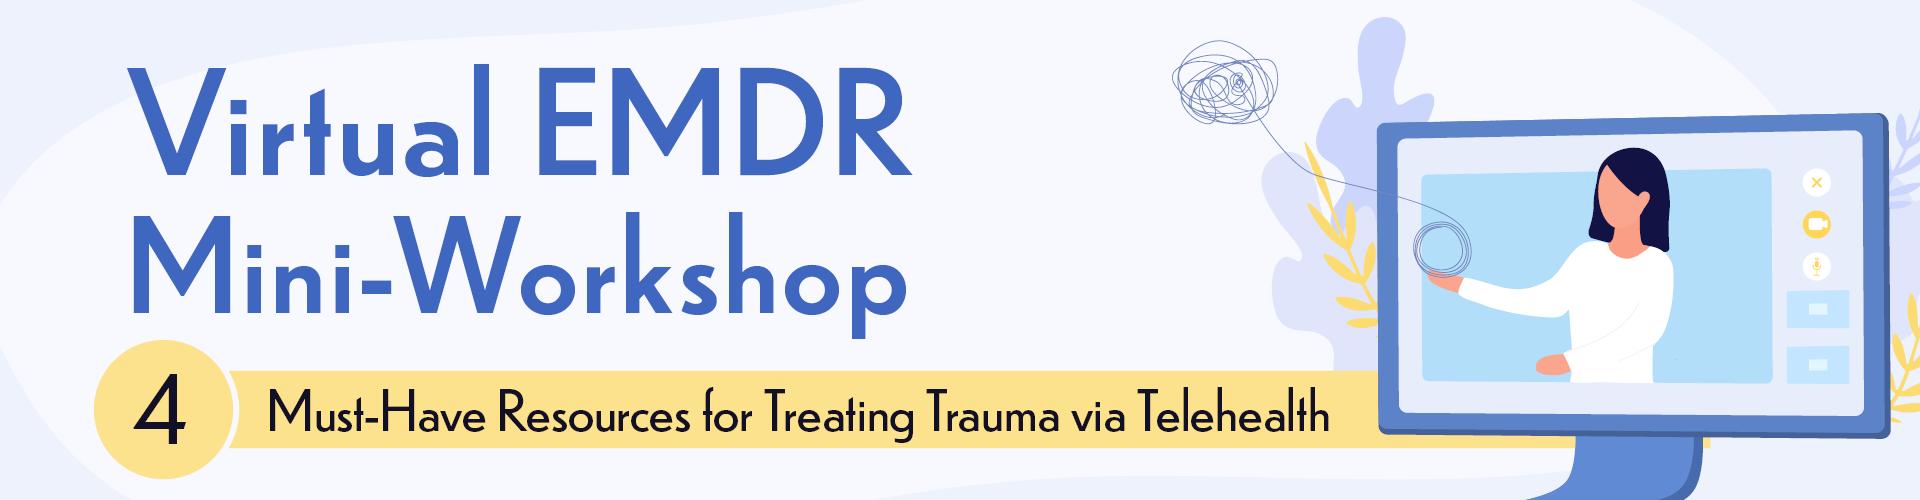 Virtual EMDR Mini-Workshop: 4 Must-Have Resources for Treating Trauma via Telehealth